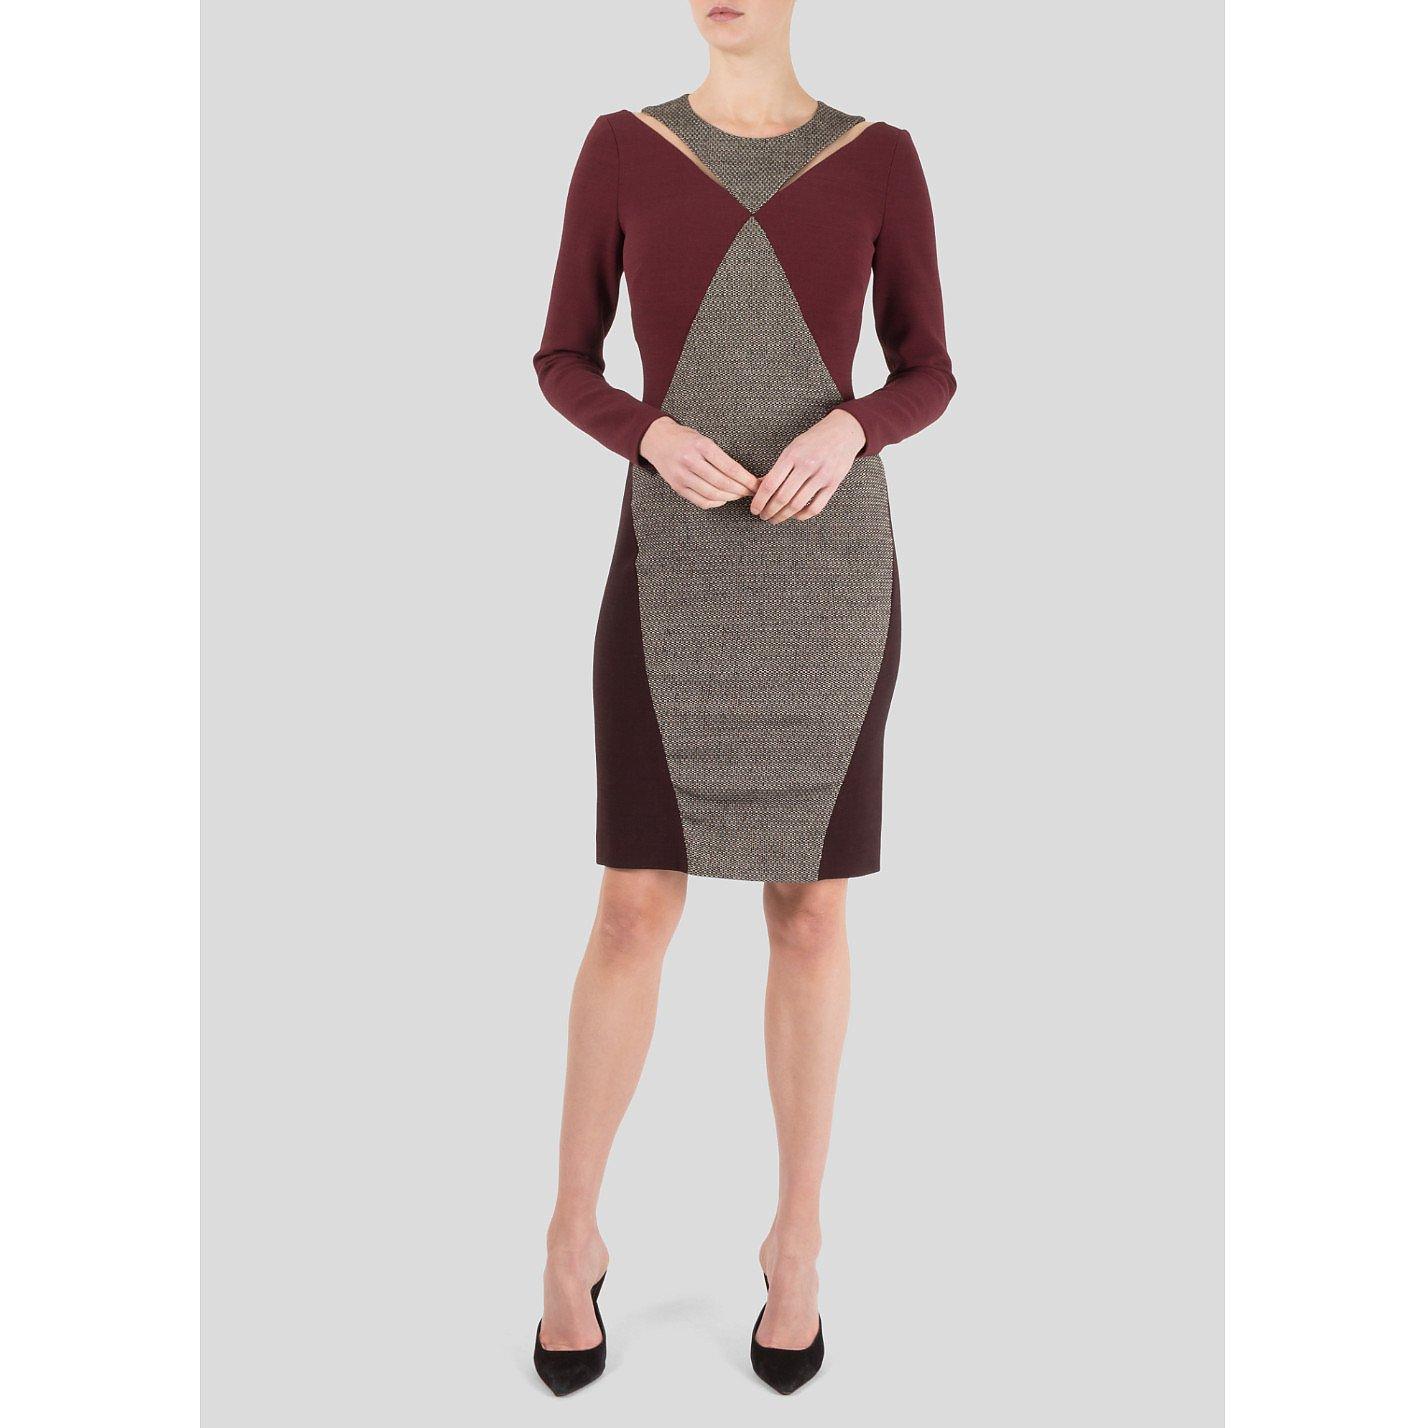 Stella McCartney Panelled Wool-Blend Dress